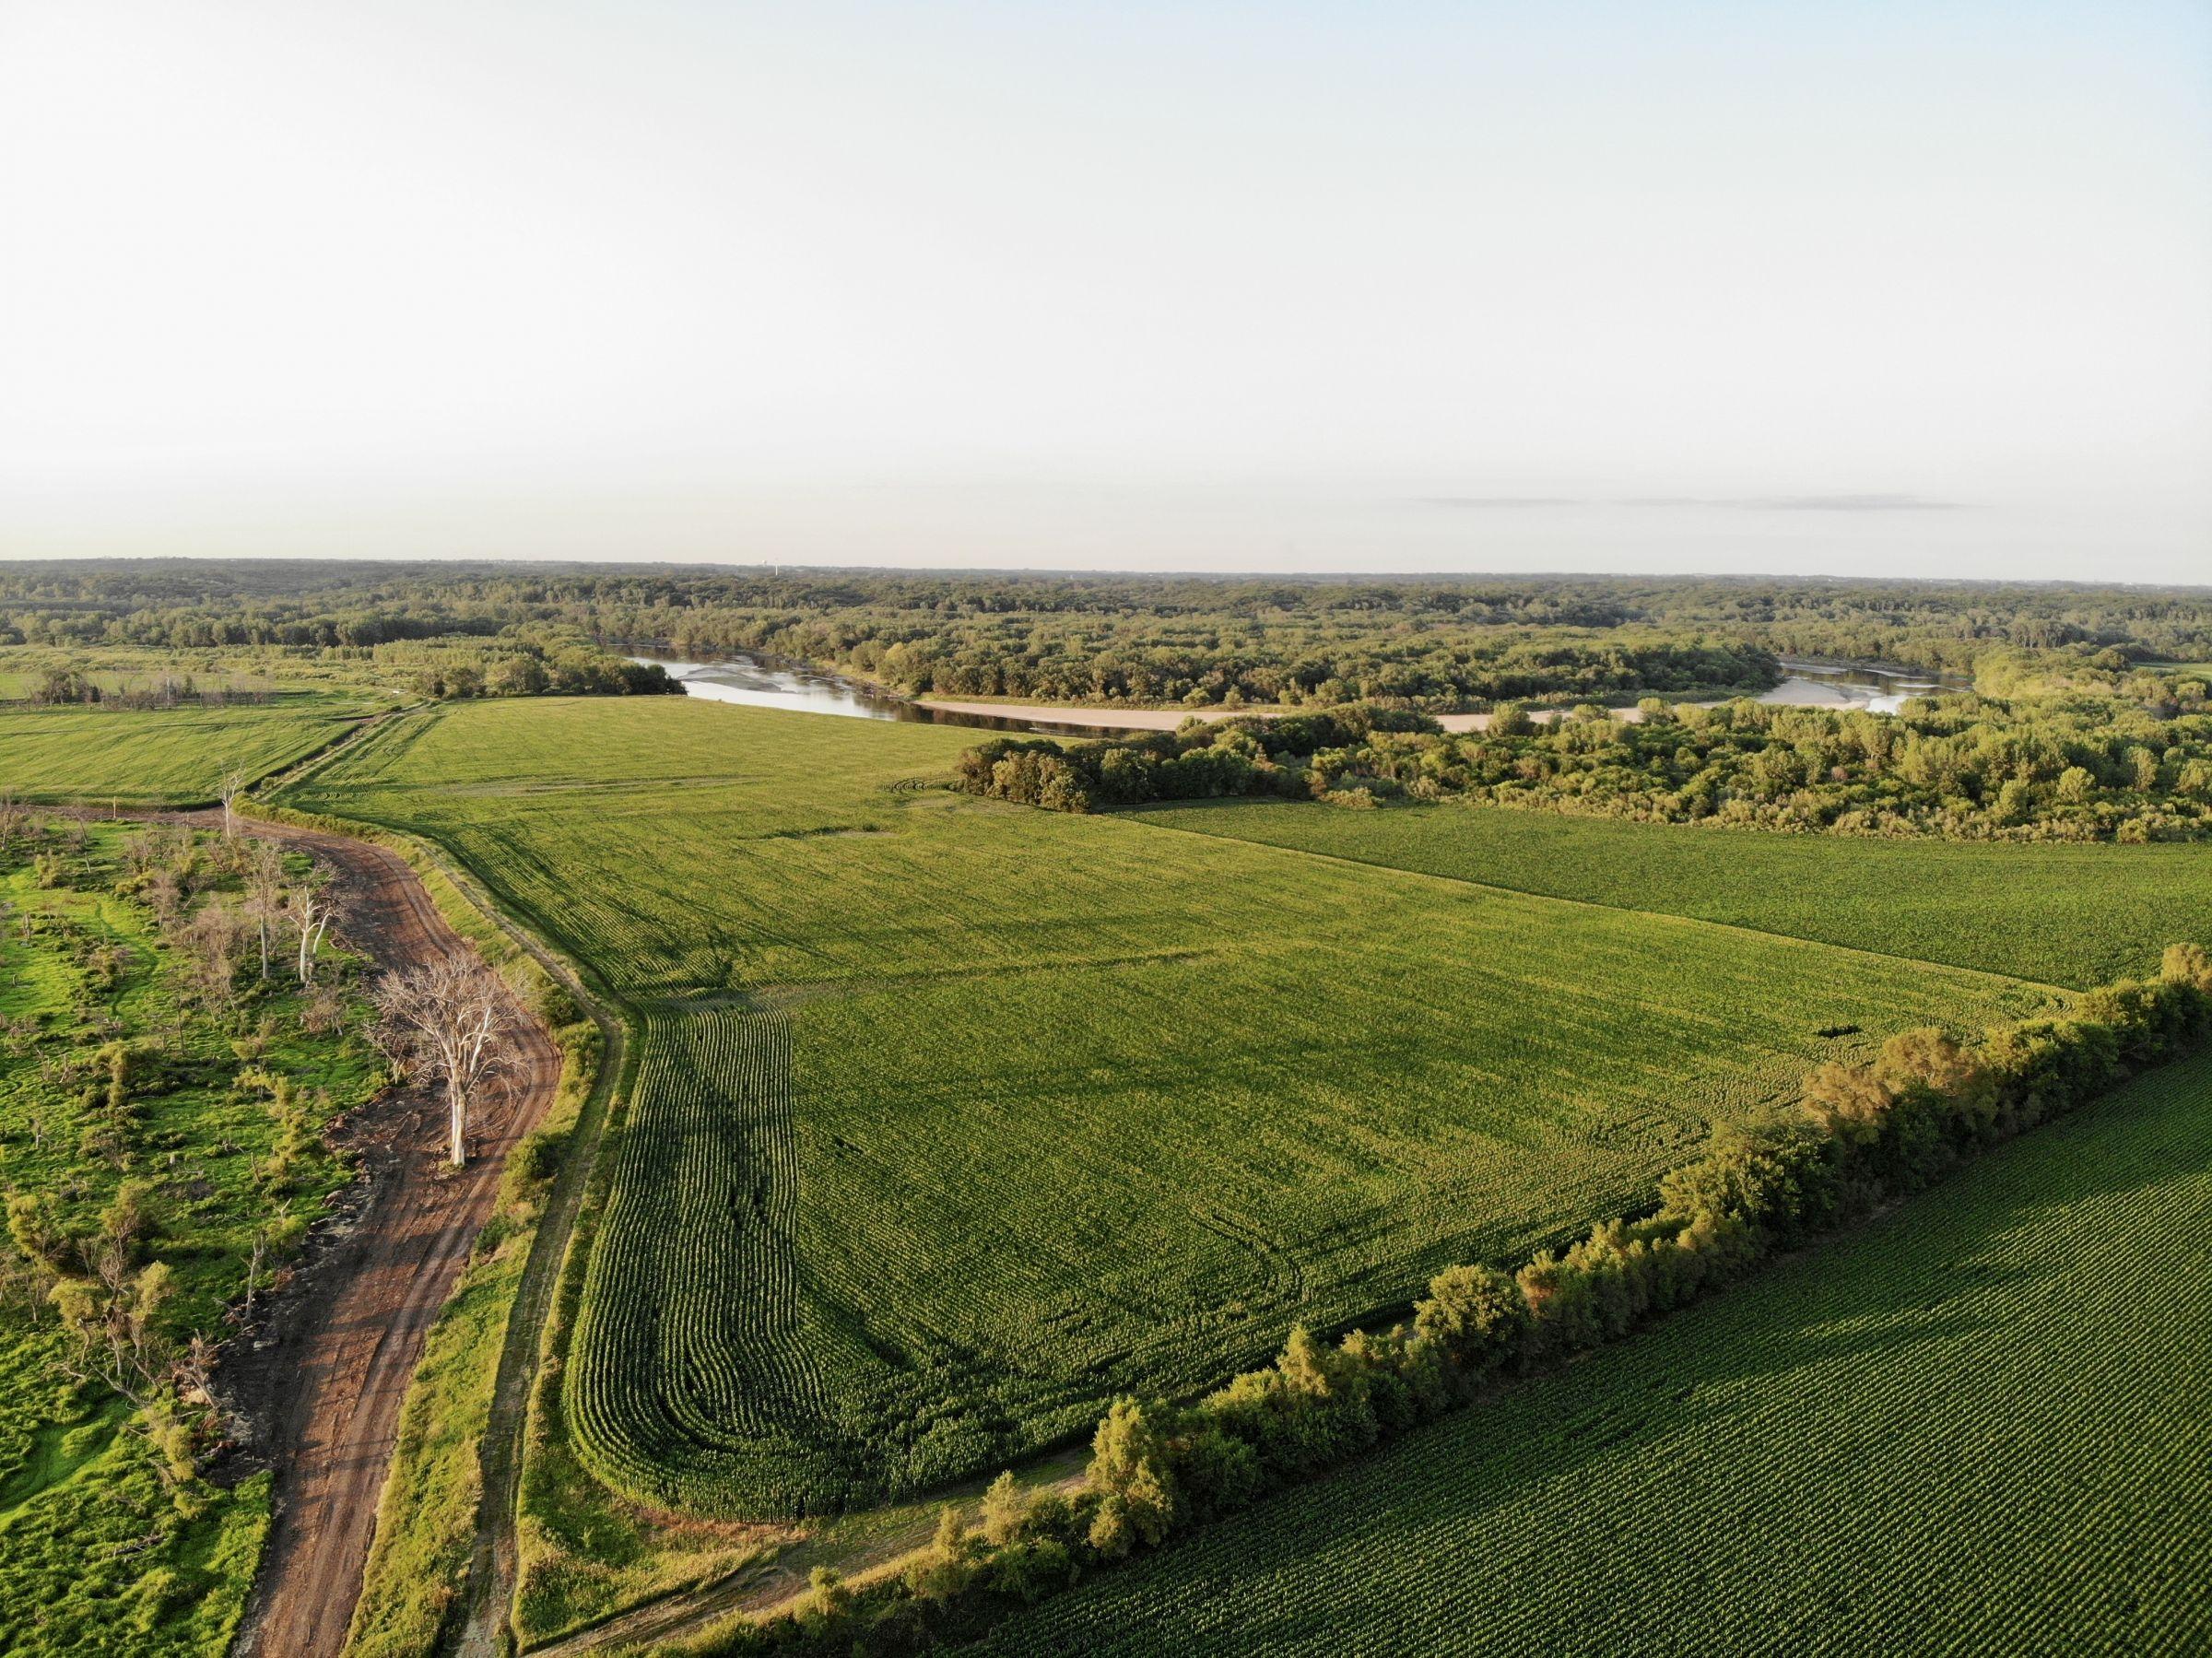 land-polk-county-iowa-202-acres-listing-number-15625-0-2021-07-09-140042.jpg